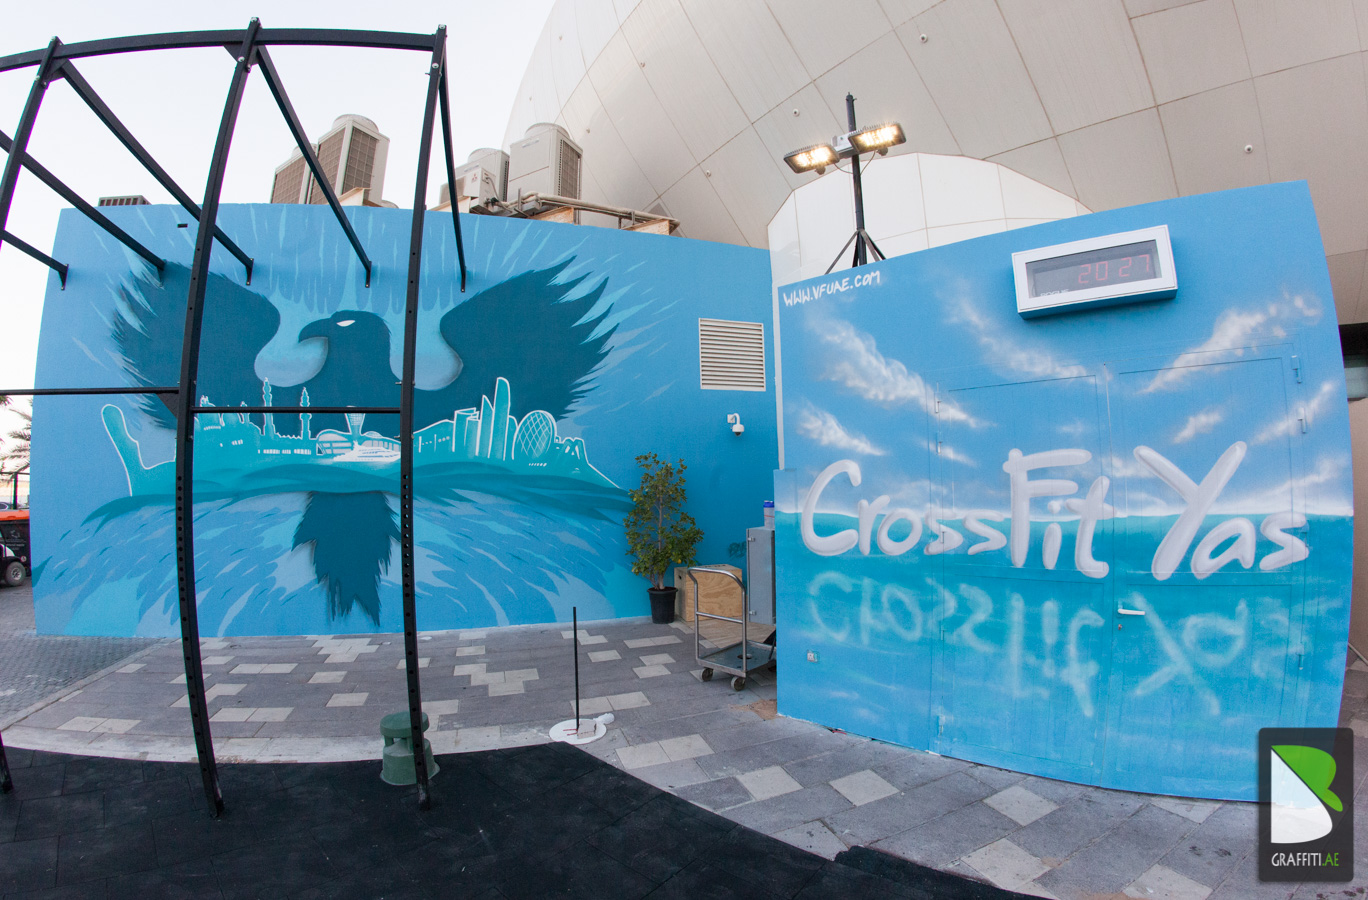 Graffiti wall uae - Crossfit Yas Marina Abu Dhabi